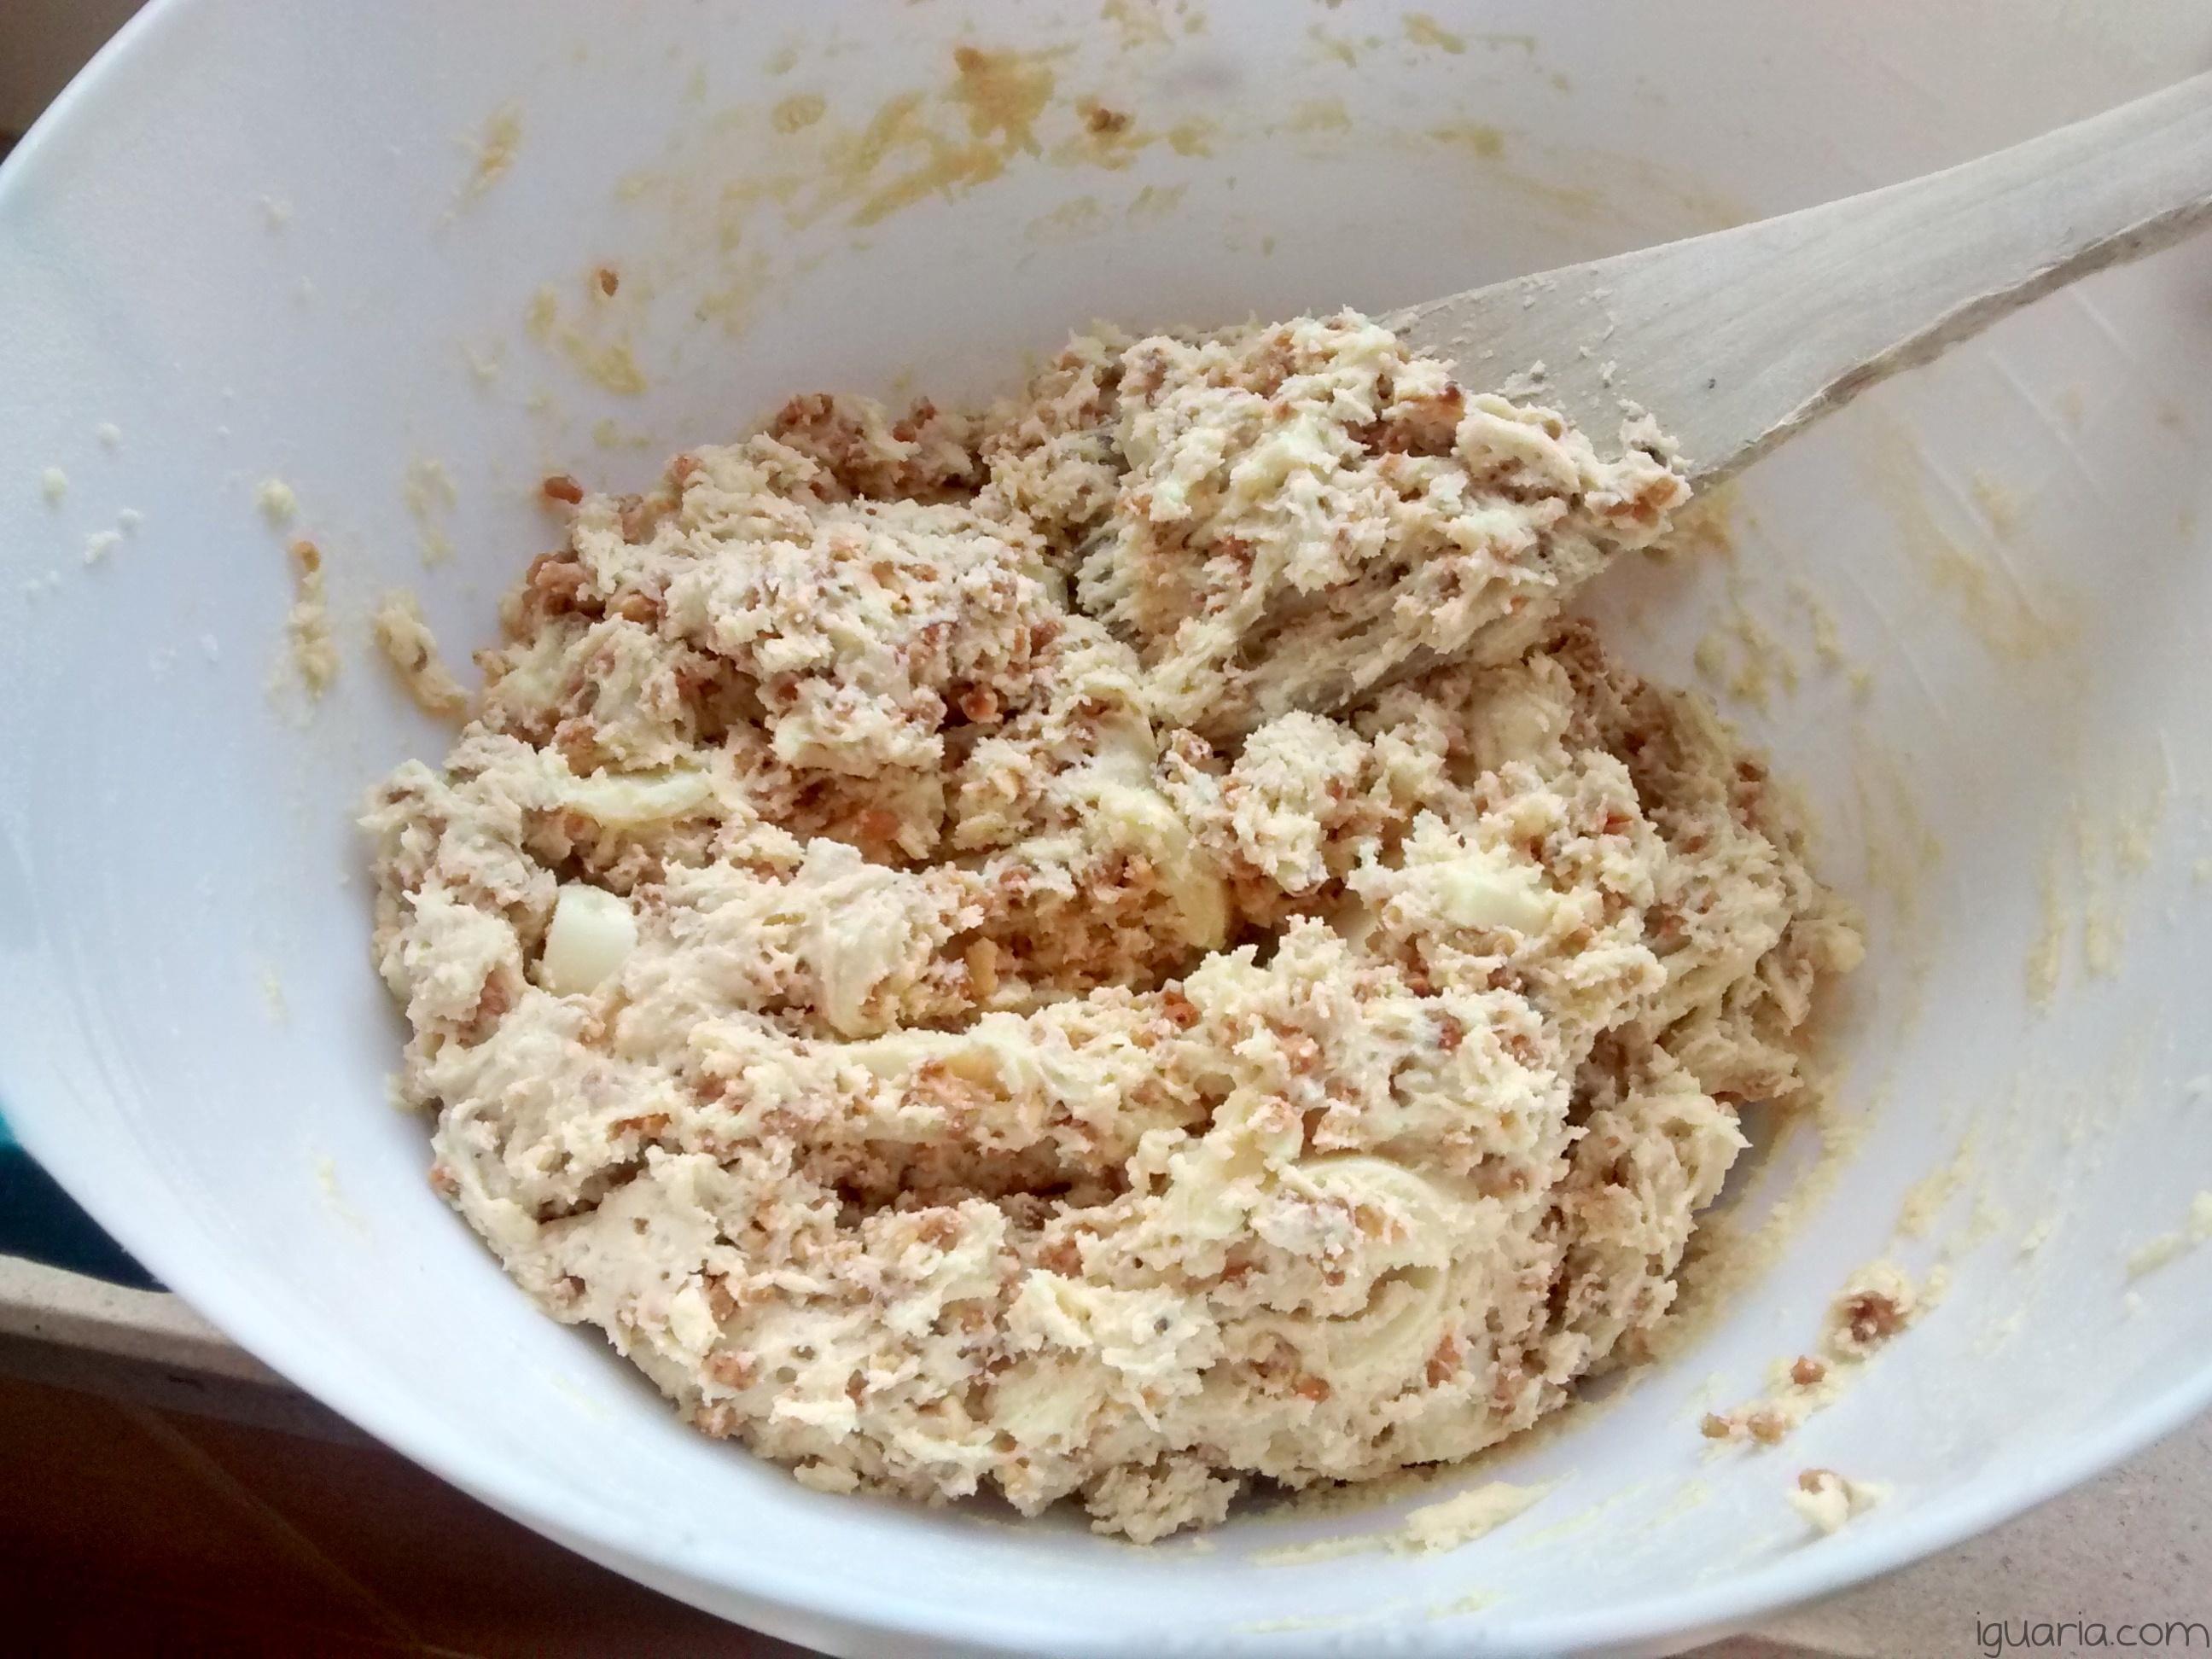 Iguaria_Massa-Biscoito-Chocolate-Branco-Pronta